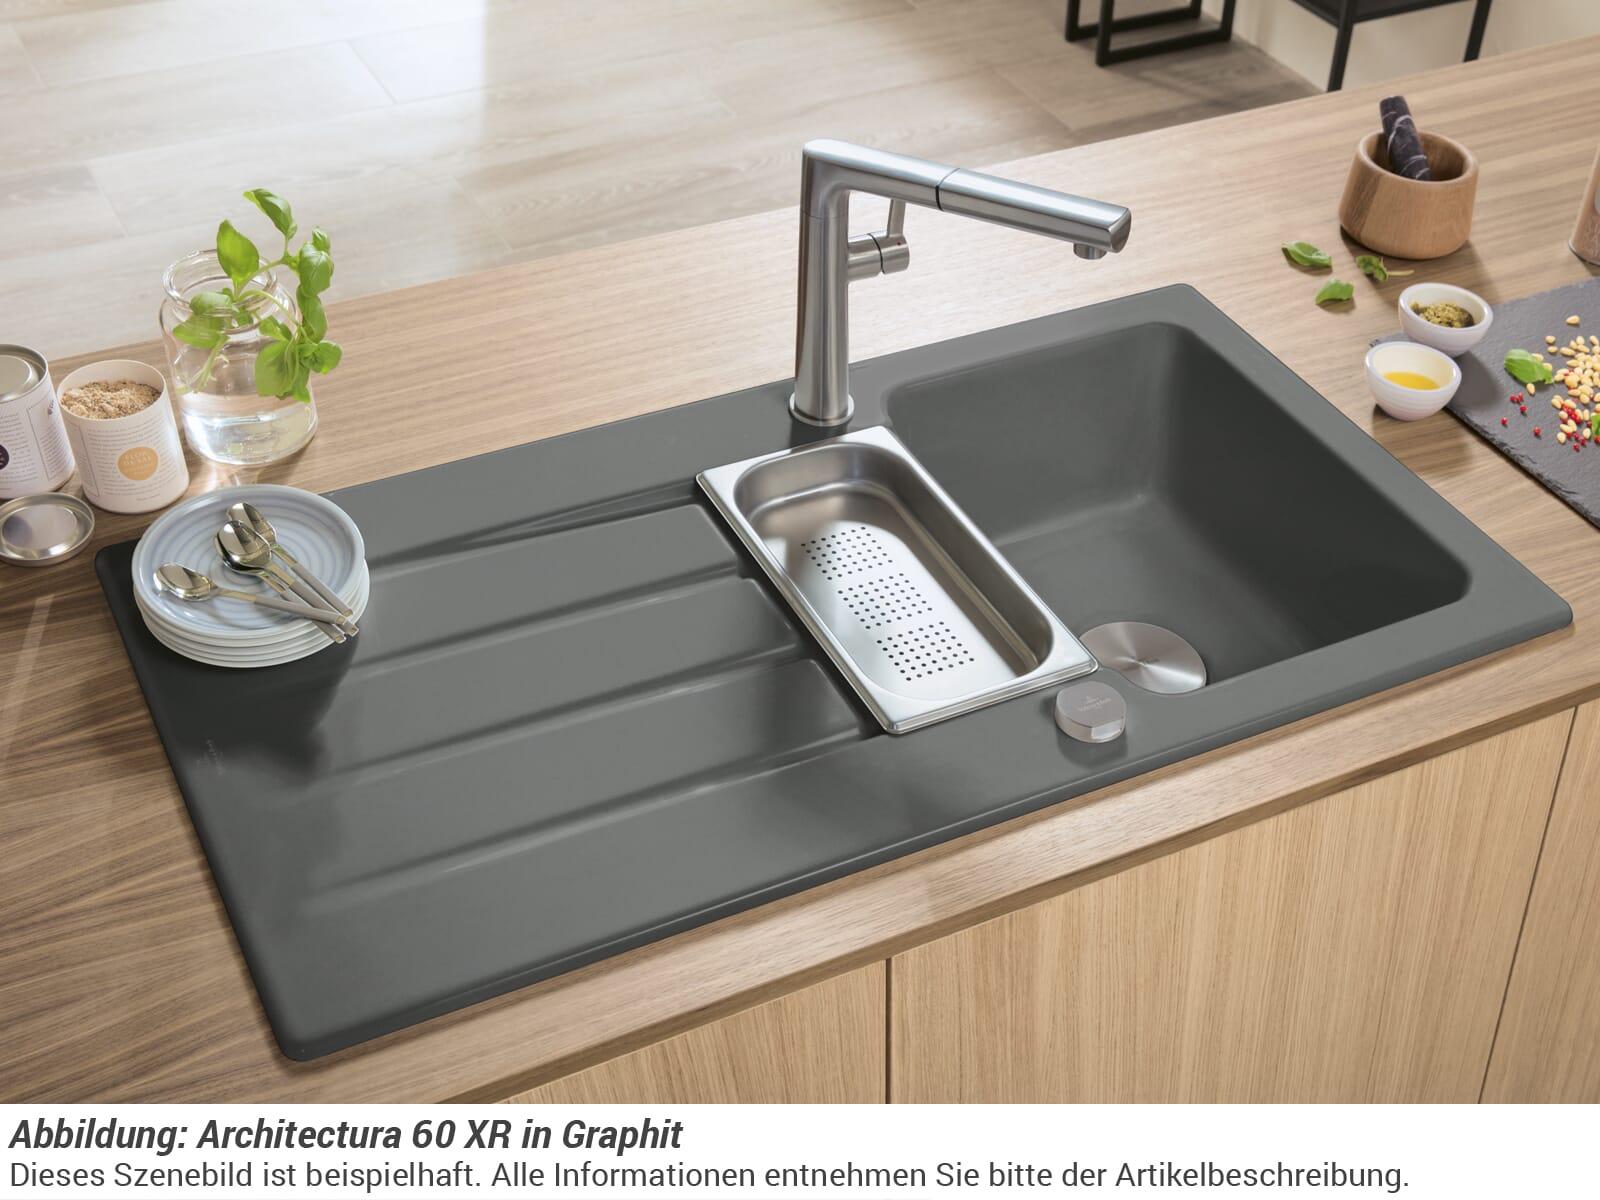 Villeroy & Boch Architectura 60 XR - 3365 02 AM Almond Keramikspüle Exzenterbetätigung